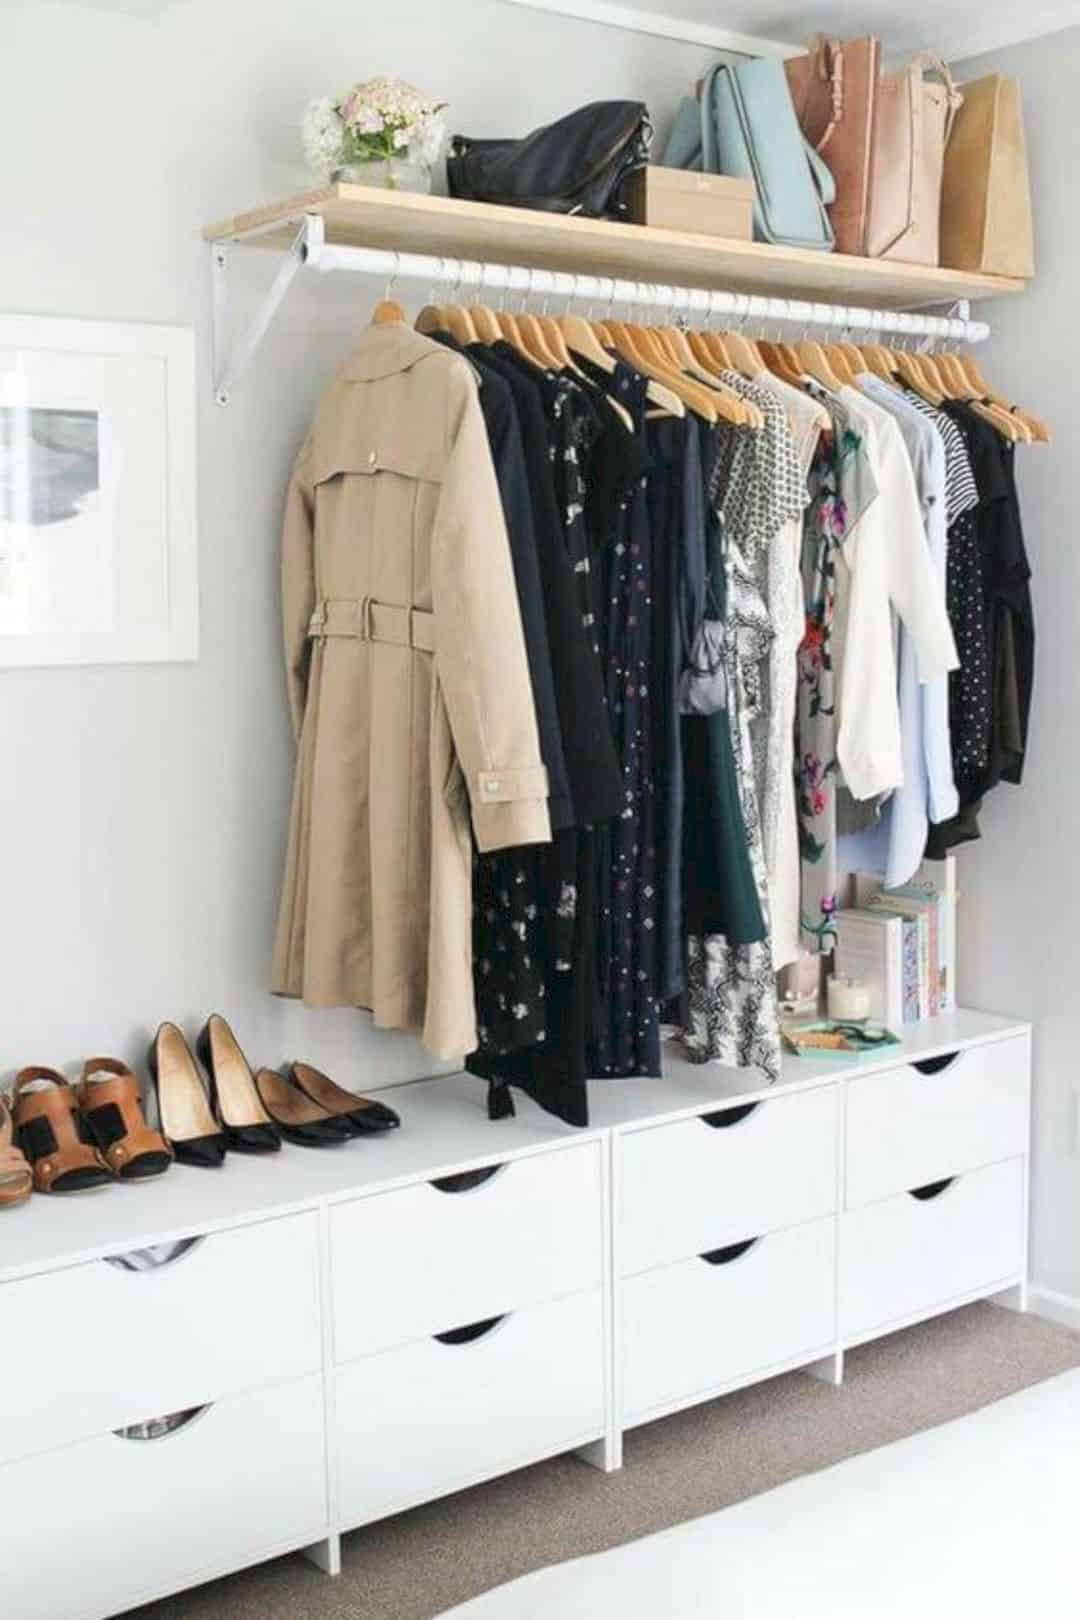 5 Stunning Bedroom Storage Ideas Bedroom Organization Closet Closet Small Bedroom Closet Bedroom